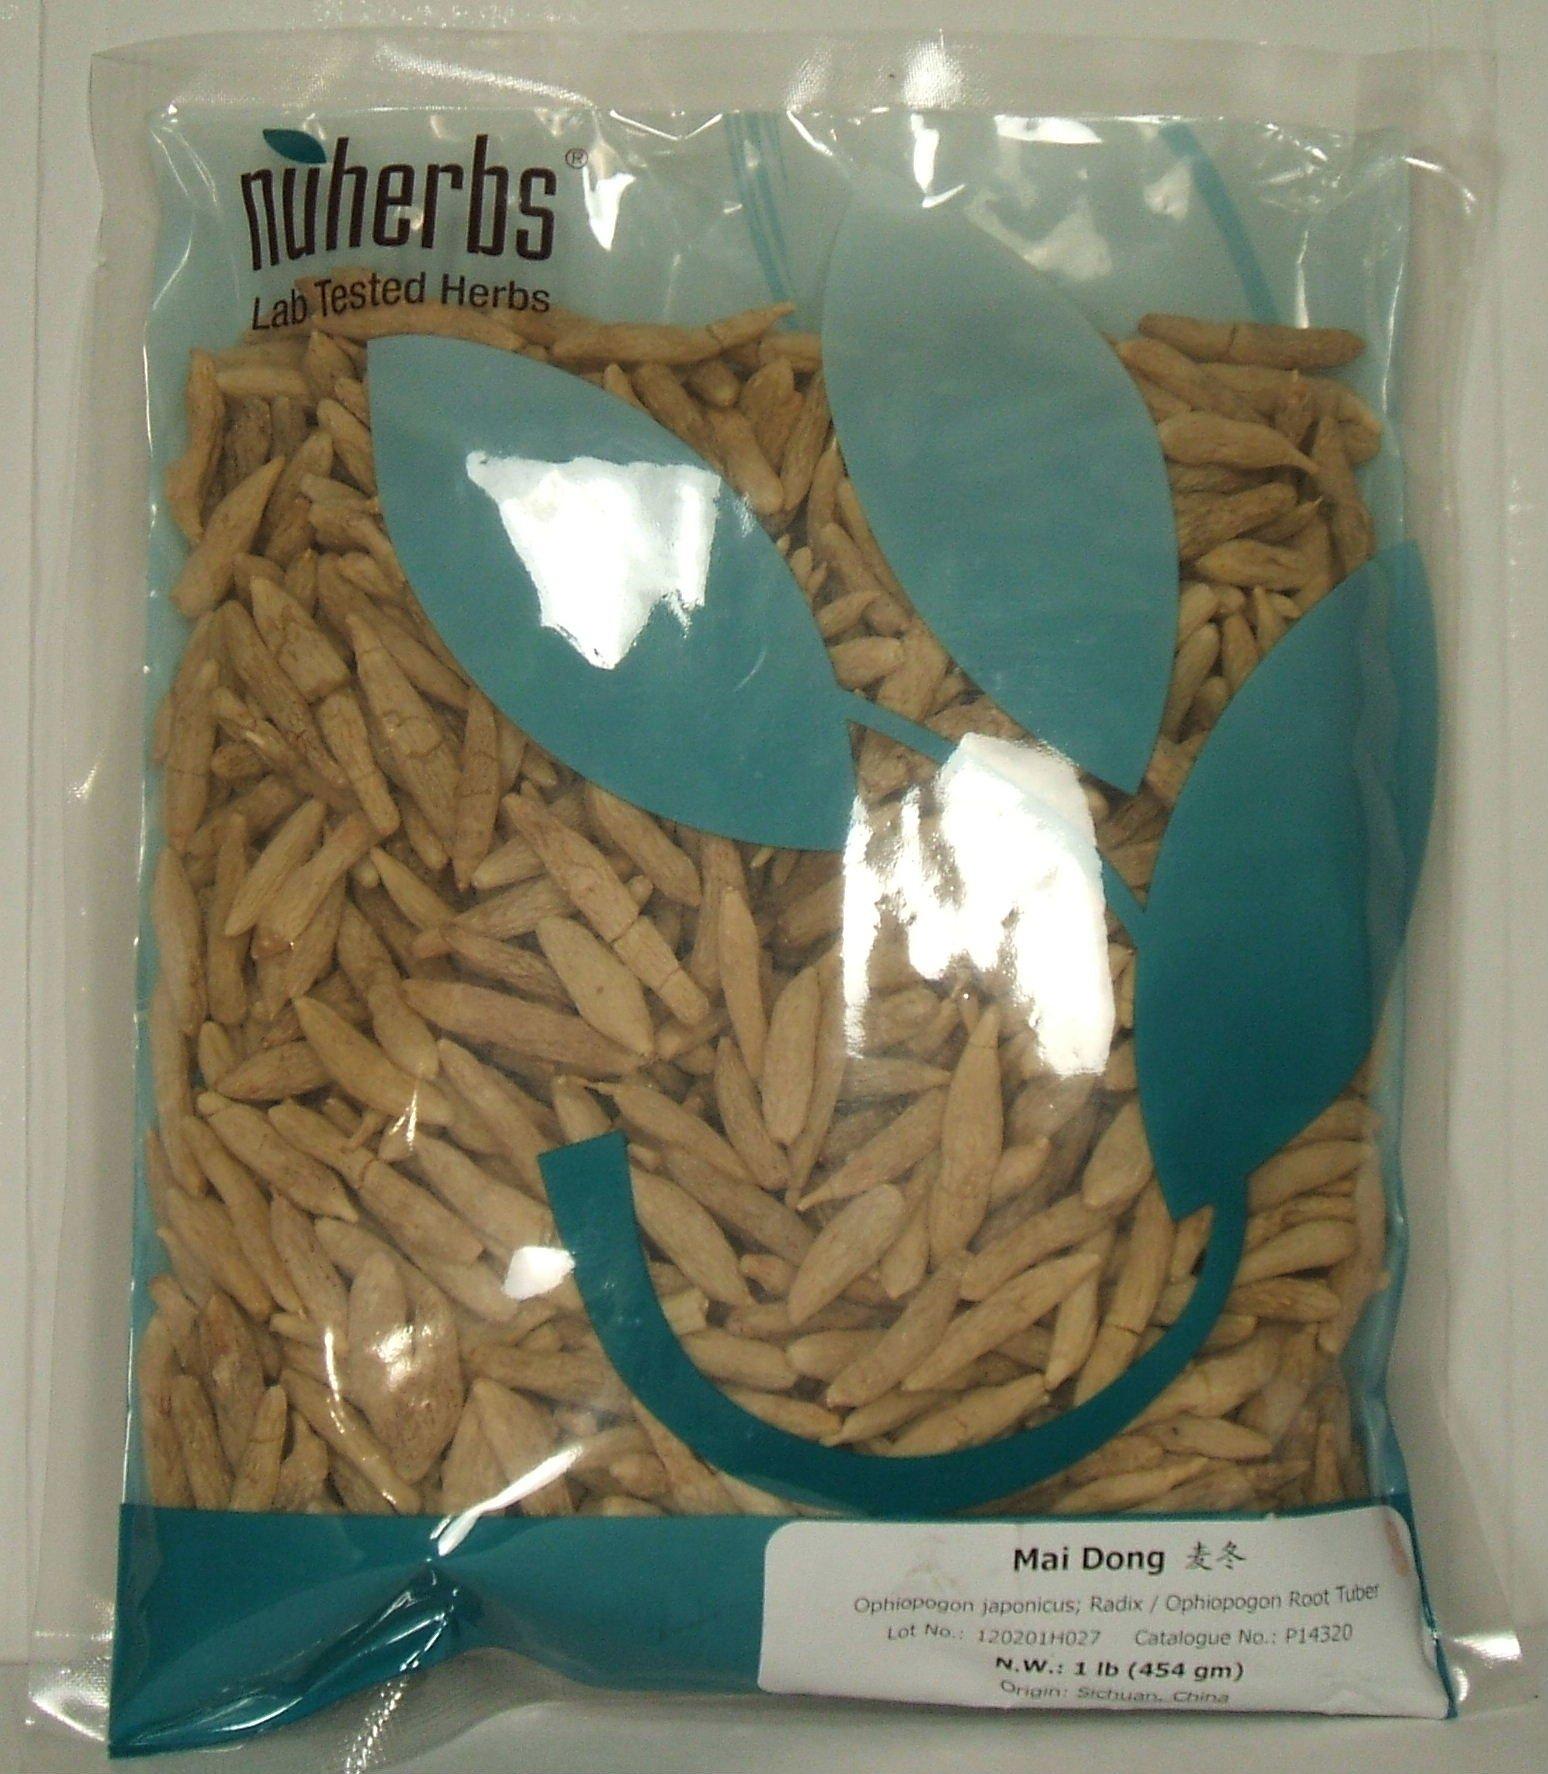 Ophiopogon Root Tuber / Mai Men Dong, 1lb, 454g Bulk Herb